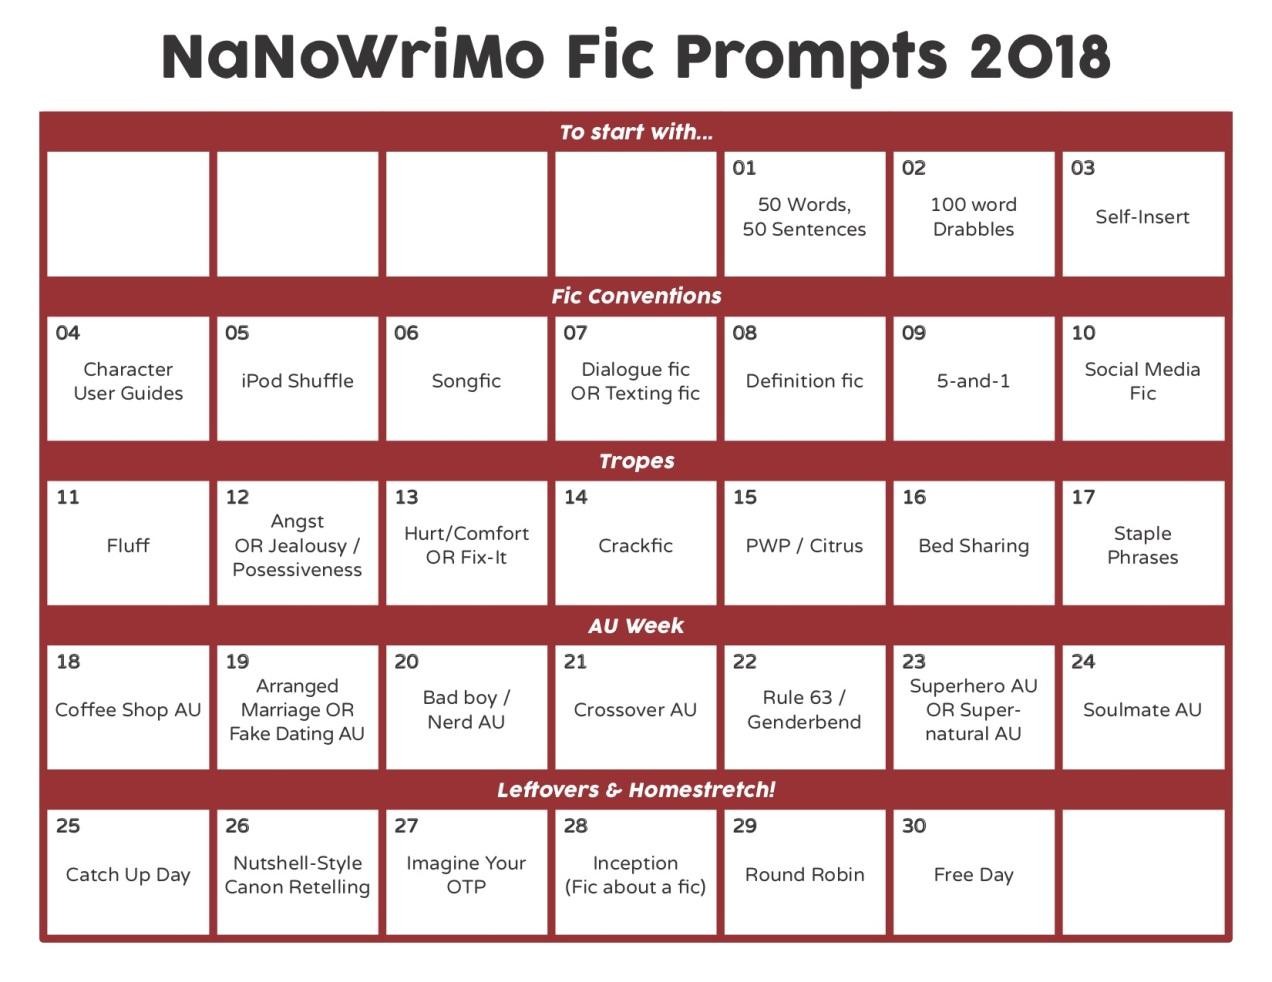 nanowrimo prompt calendar